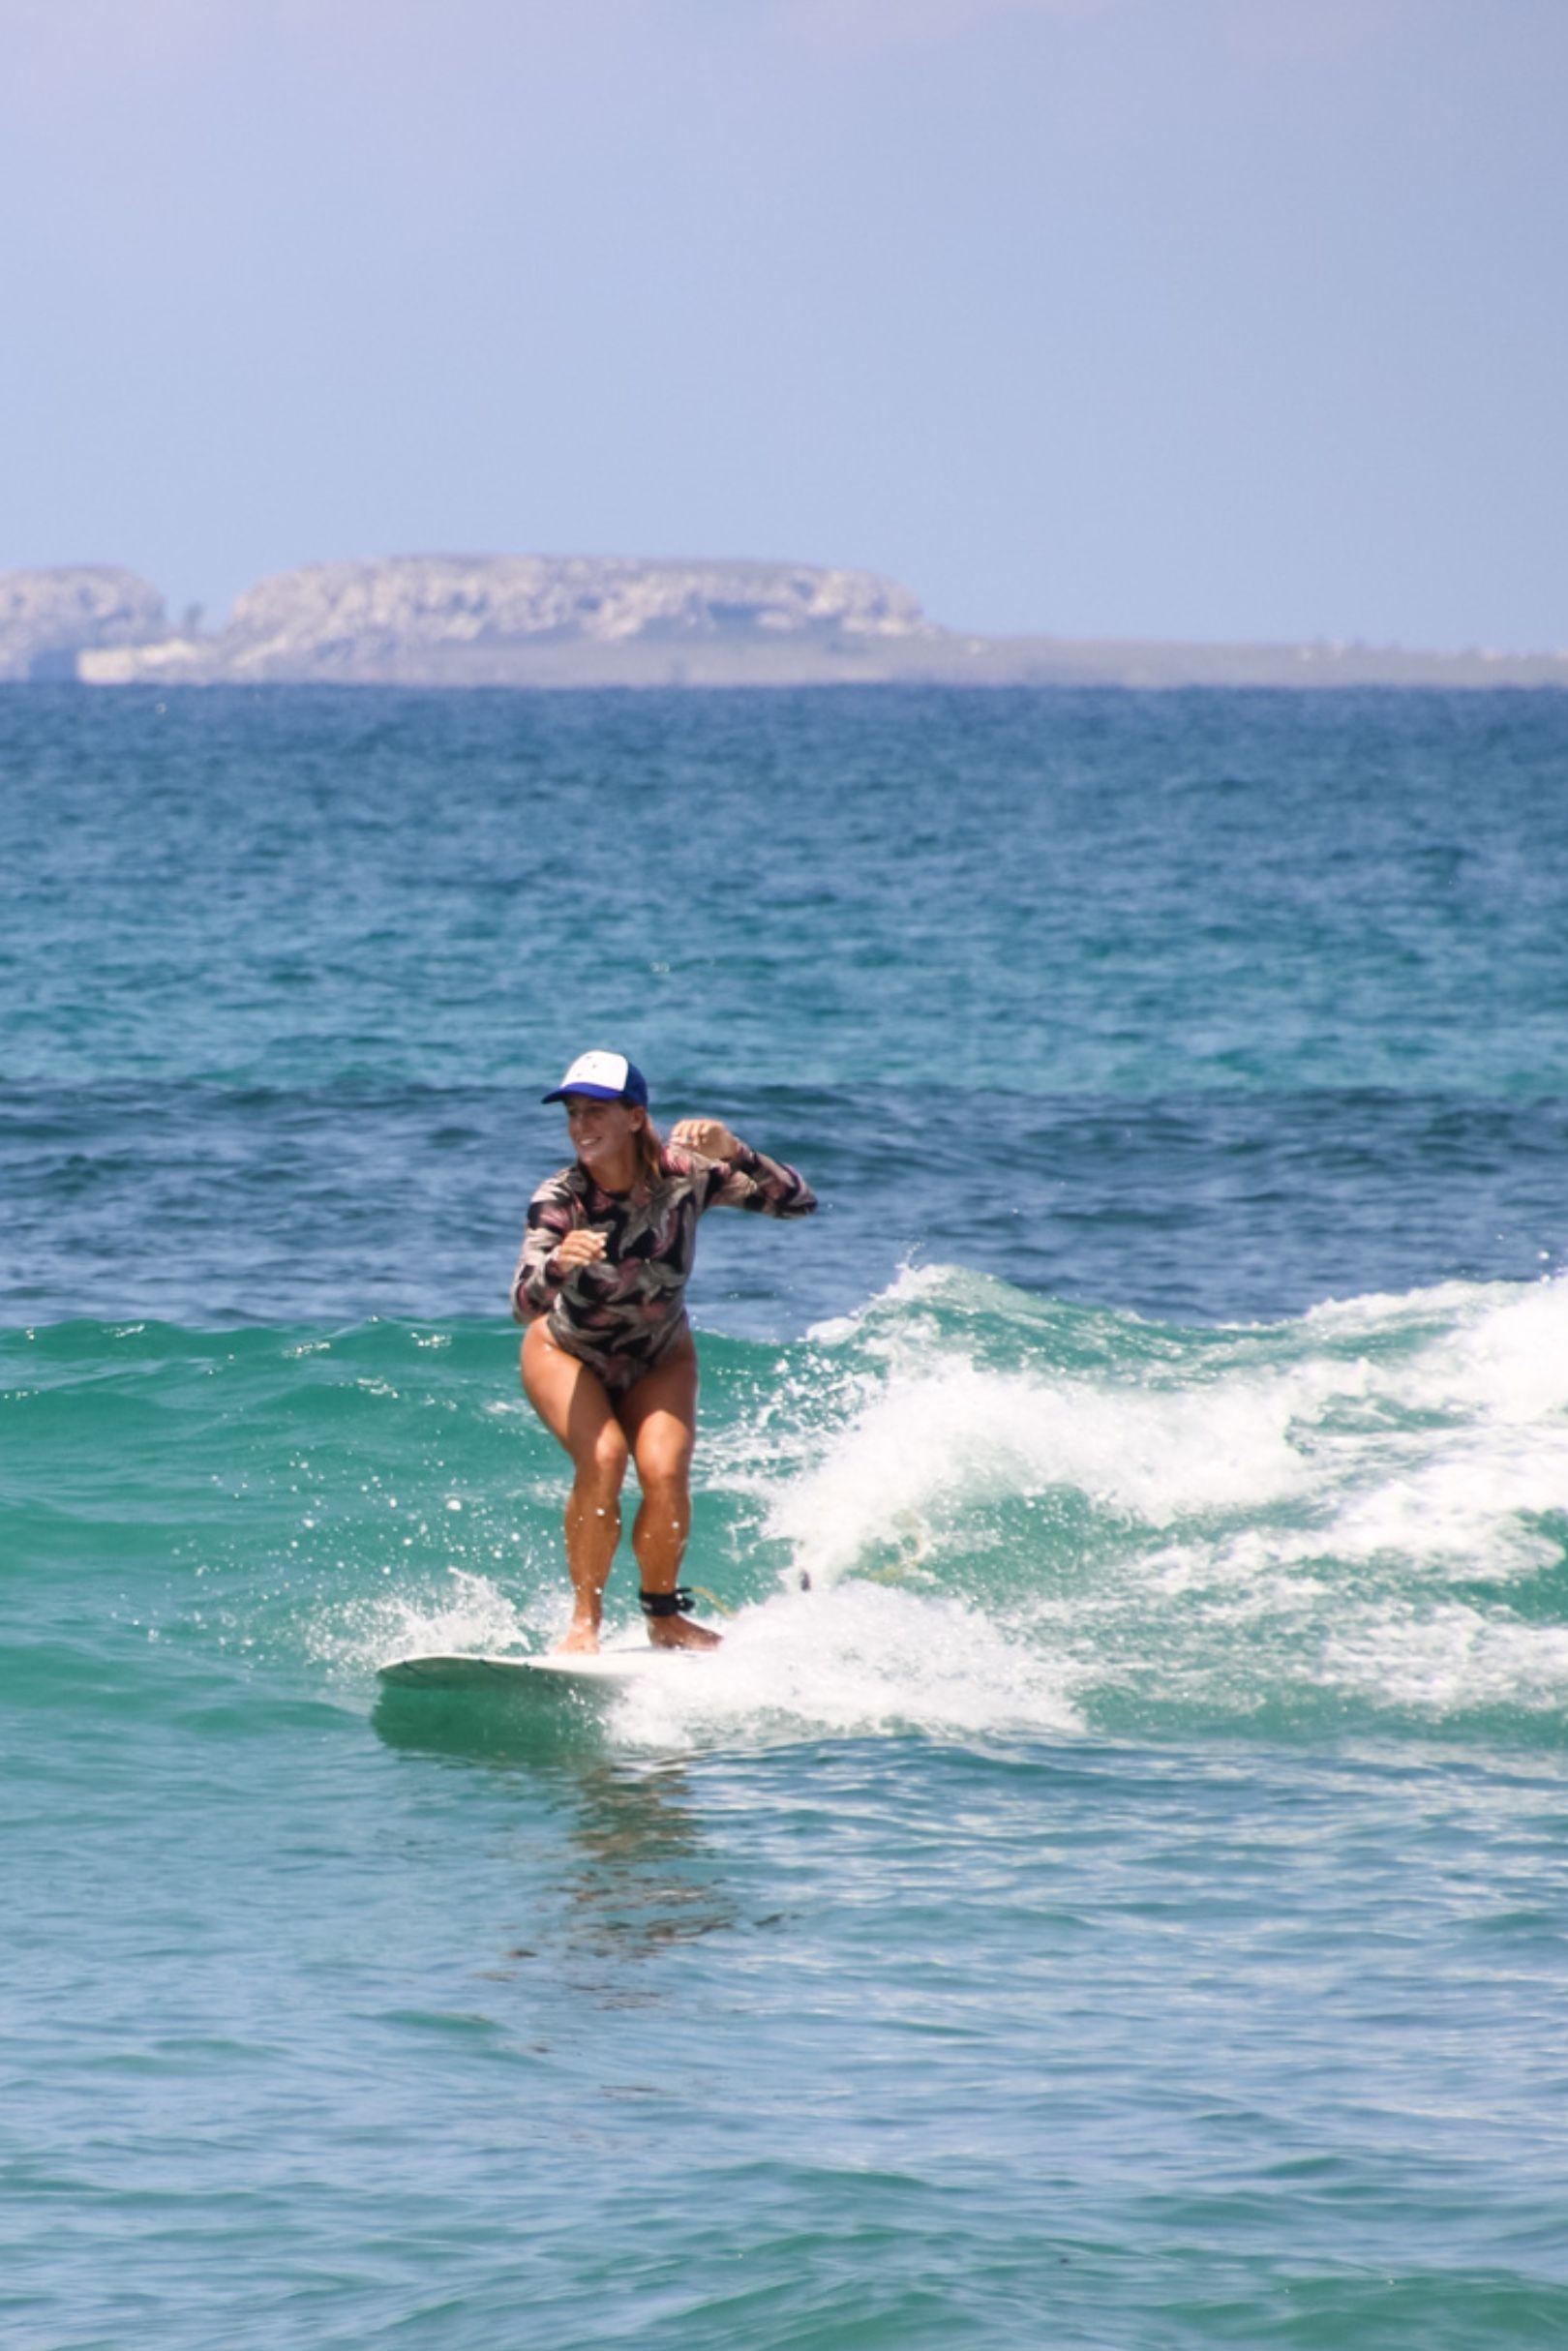 Surf Ii Surf Camp Mexico Resorts Spa Vacation Surf Camp